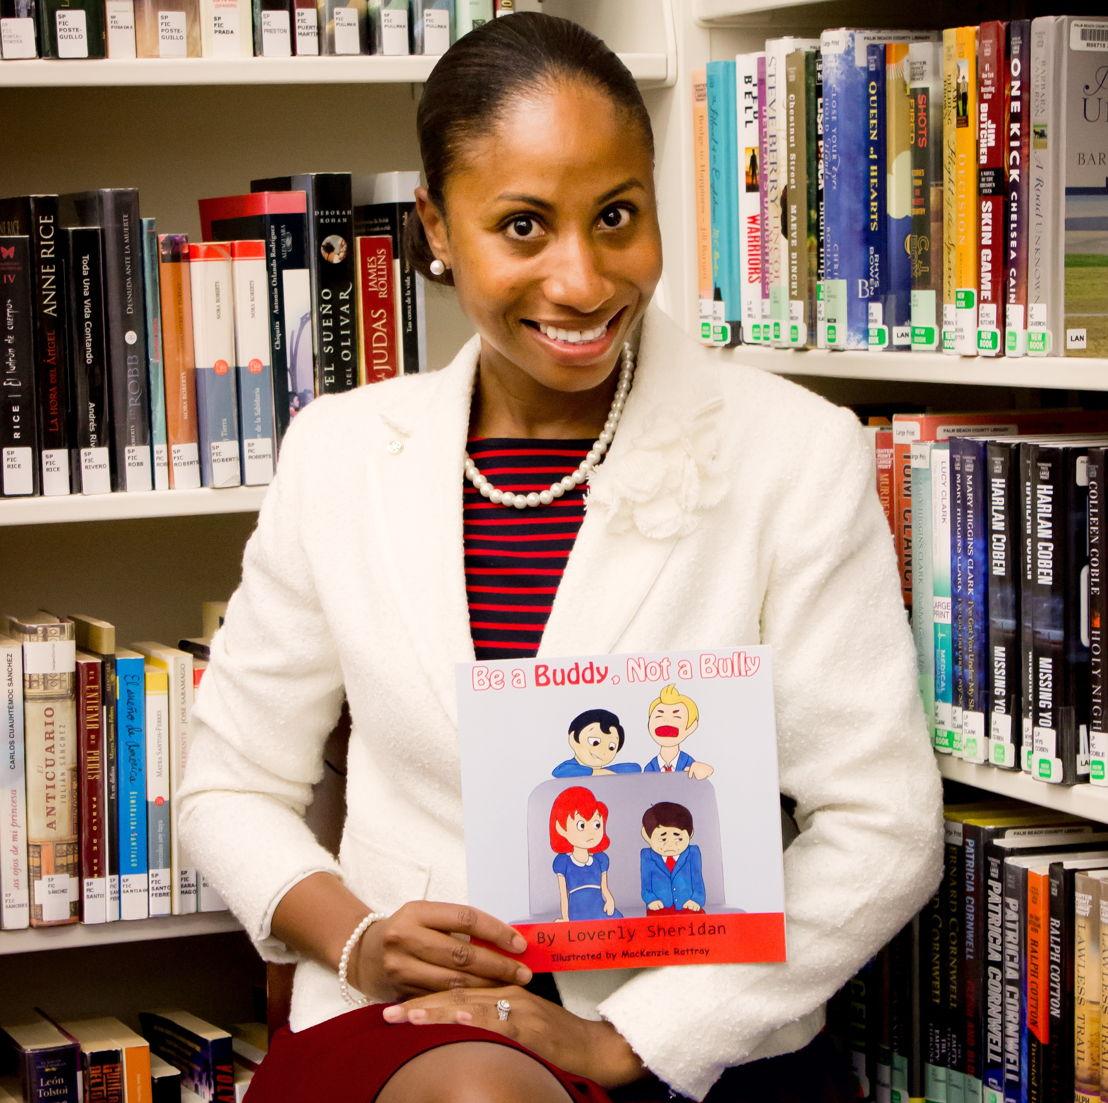 Loverly Sheridan, Saint Lucian author